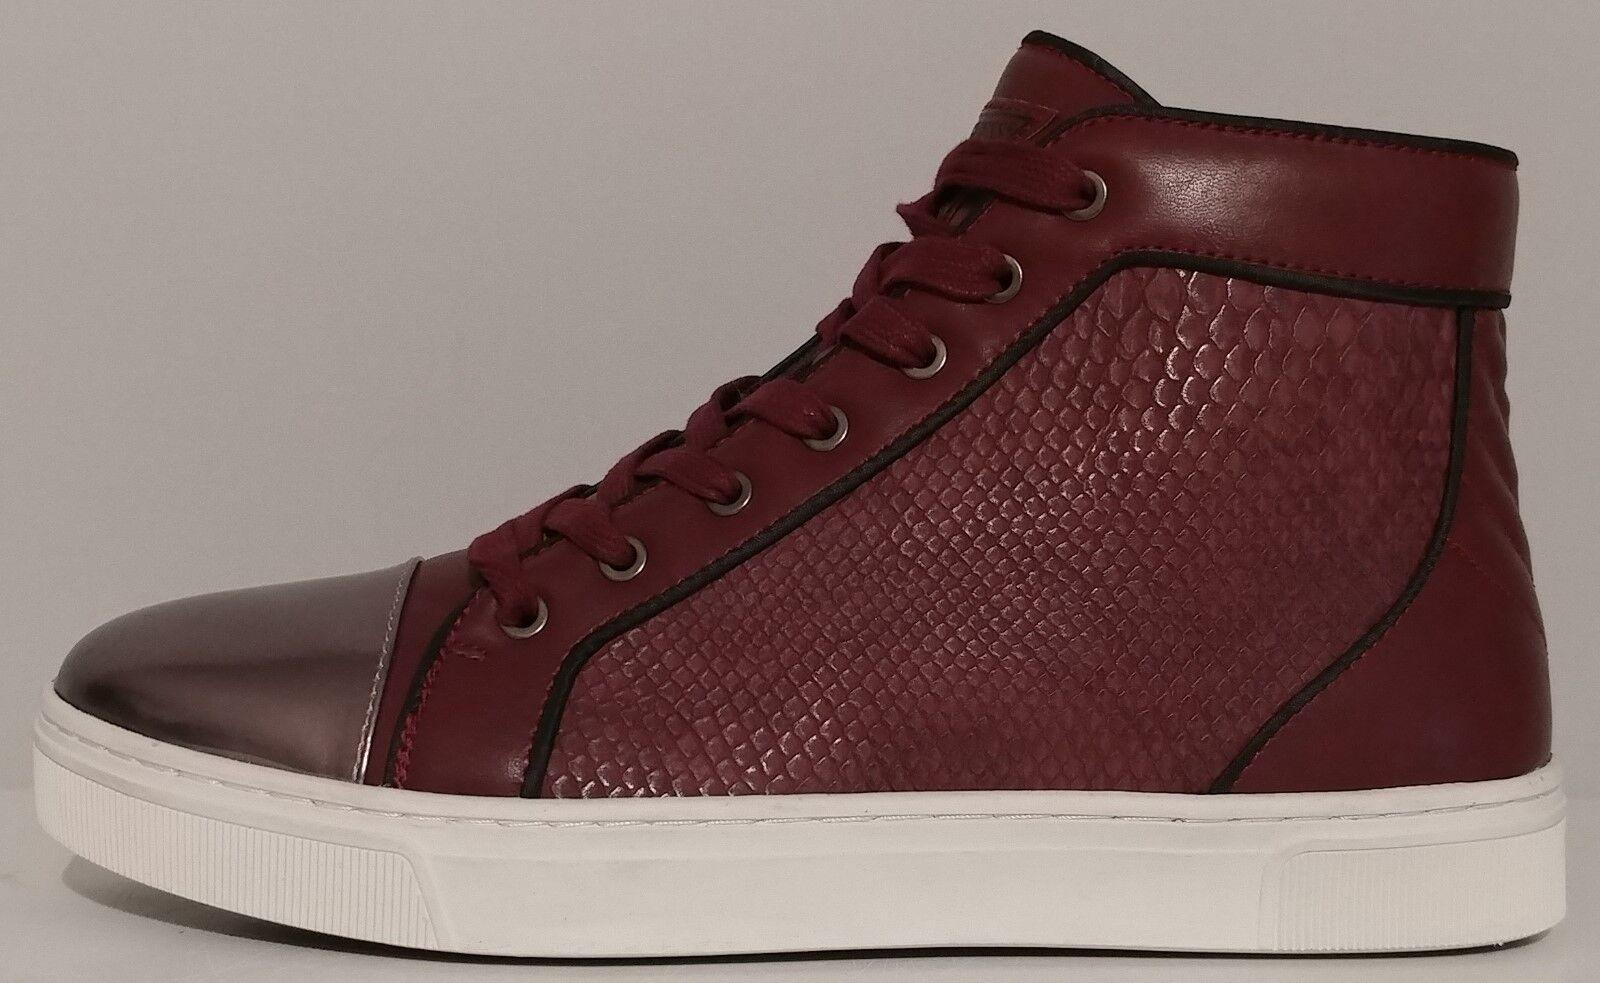 7a454a72 nuevo Para hombres Guess Rojo Cuero High Top gmboden zapatos atléticos  tamaño nos 44M EUR 11M nwisby5113-Zapatillas deportivas